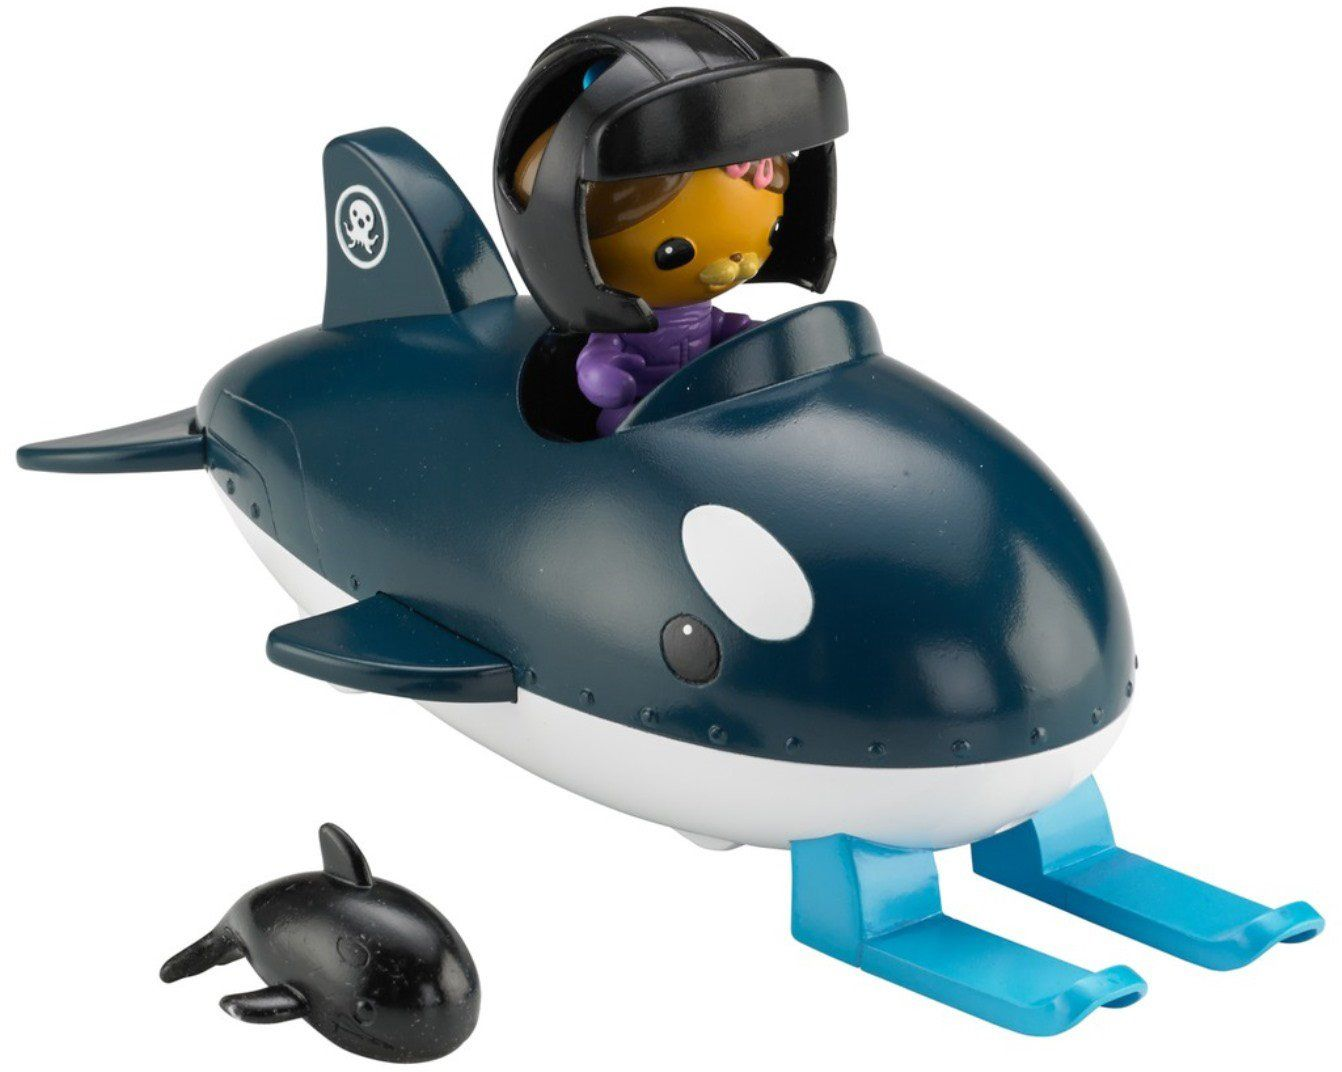 Fisher-Price Octonauts Gup-O & Dashii | Toy | Pinterest | Fisher ...